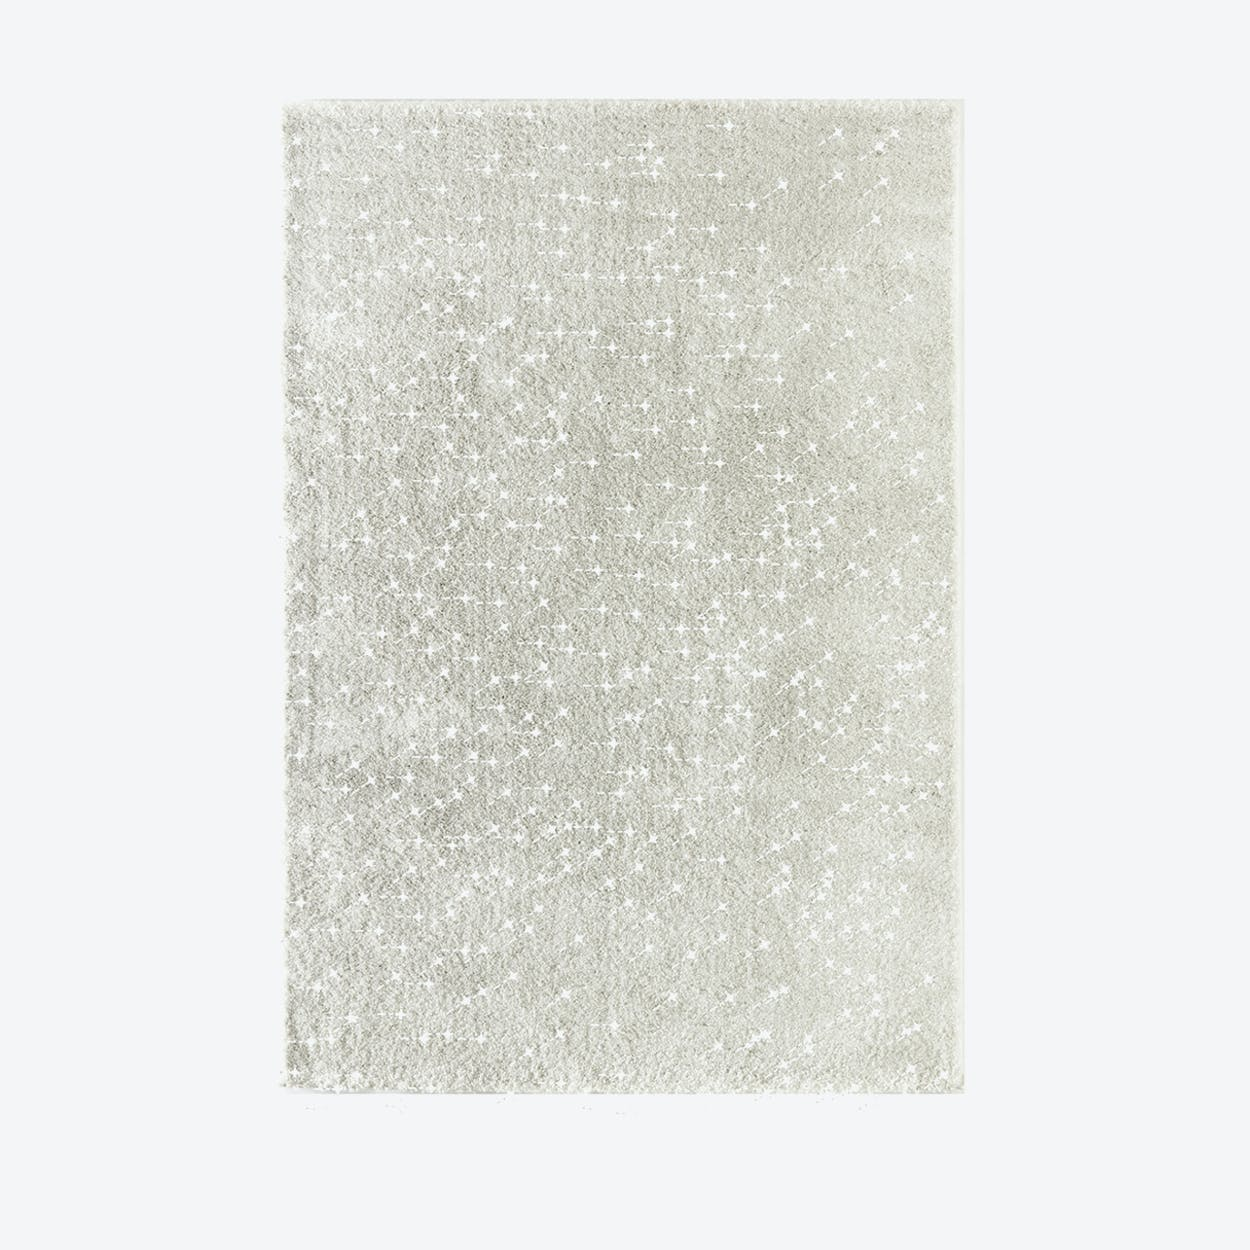 "Shiny Rug ""Sparkle"" in White (120x170 cm)"